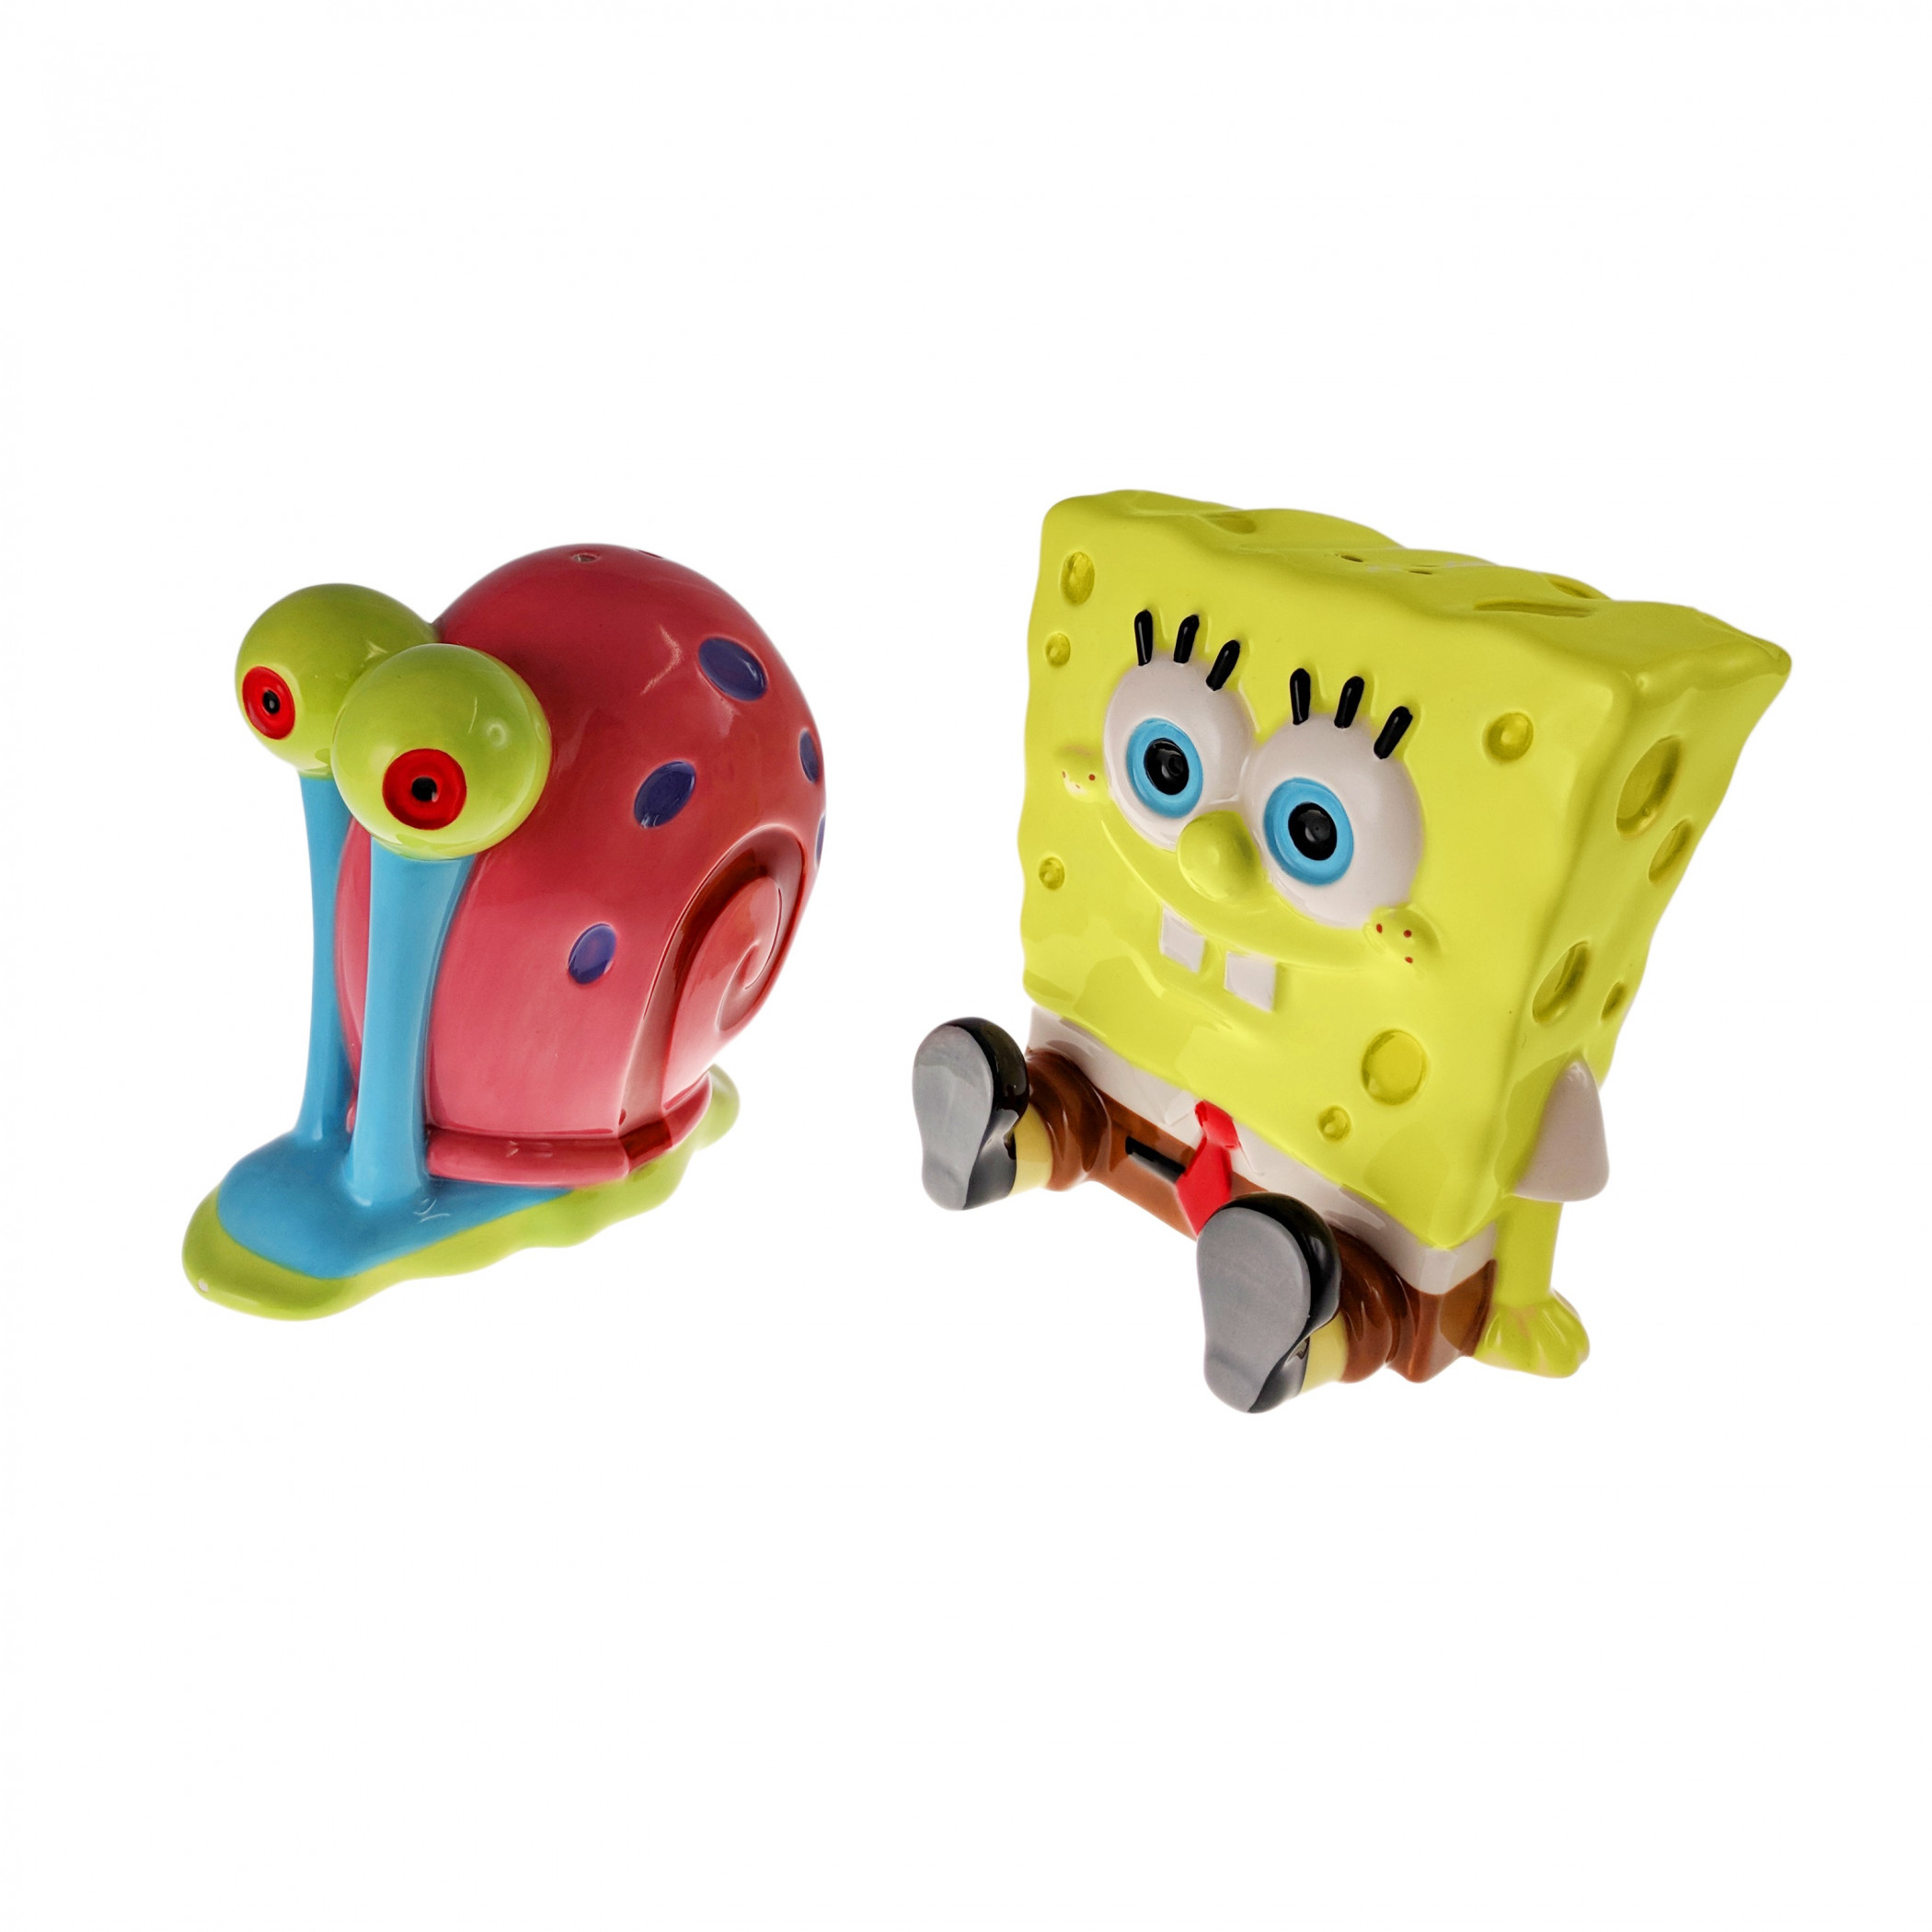 SpongeBob SquarePants and Gary Salt and Pepper Shaker Set